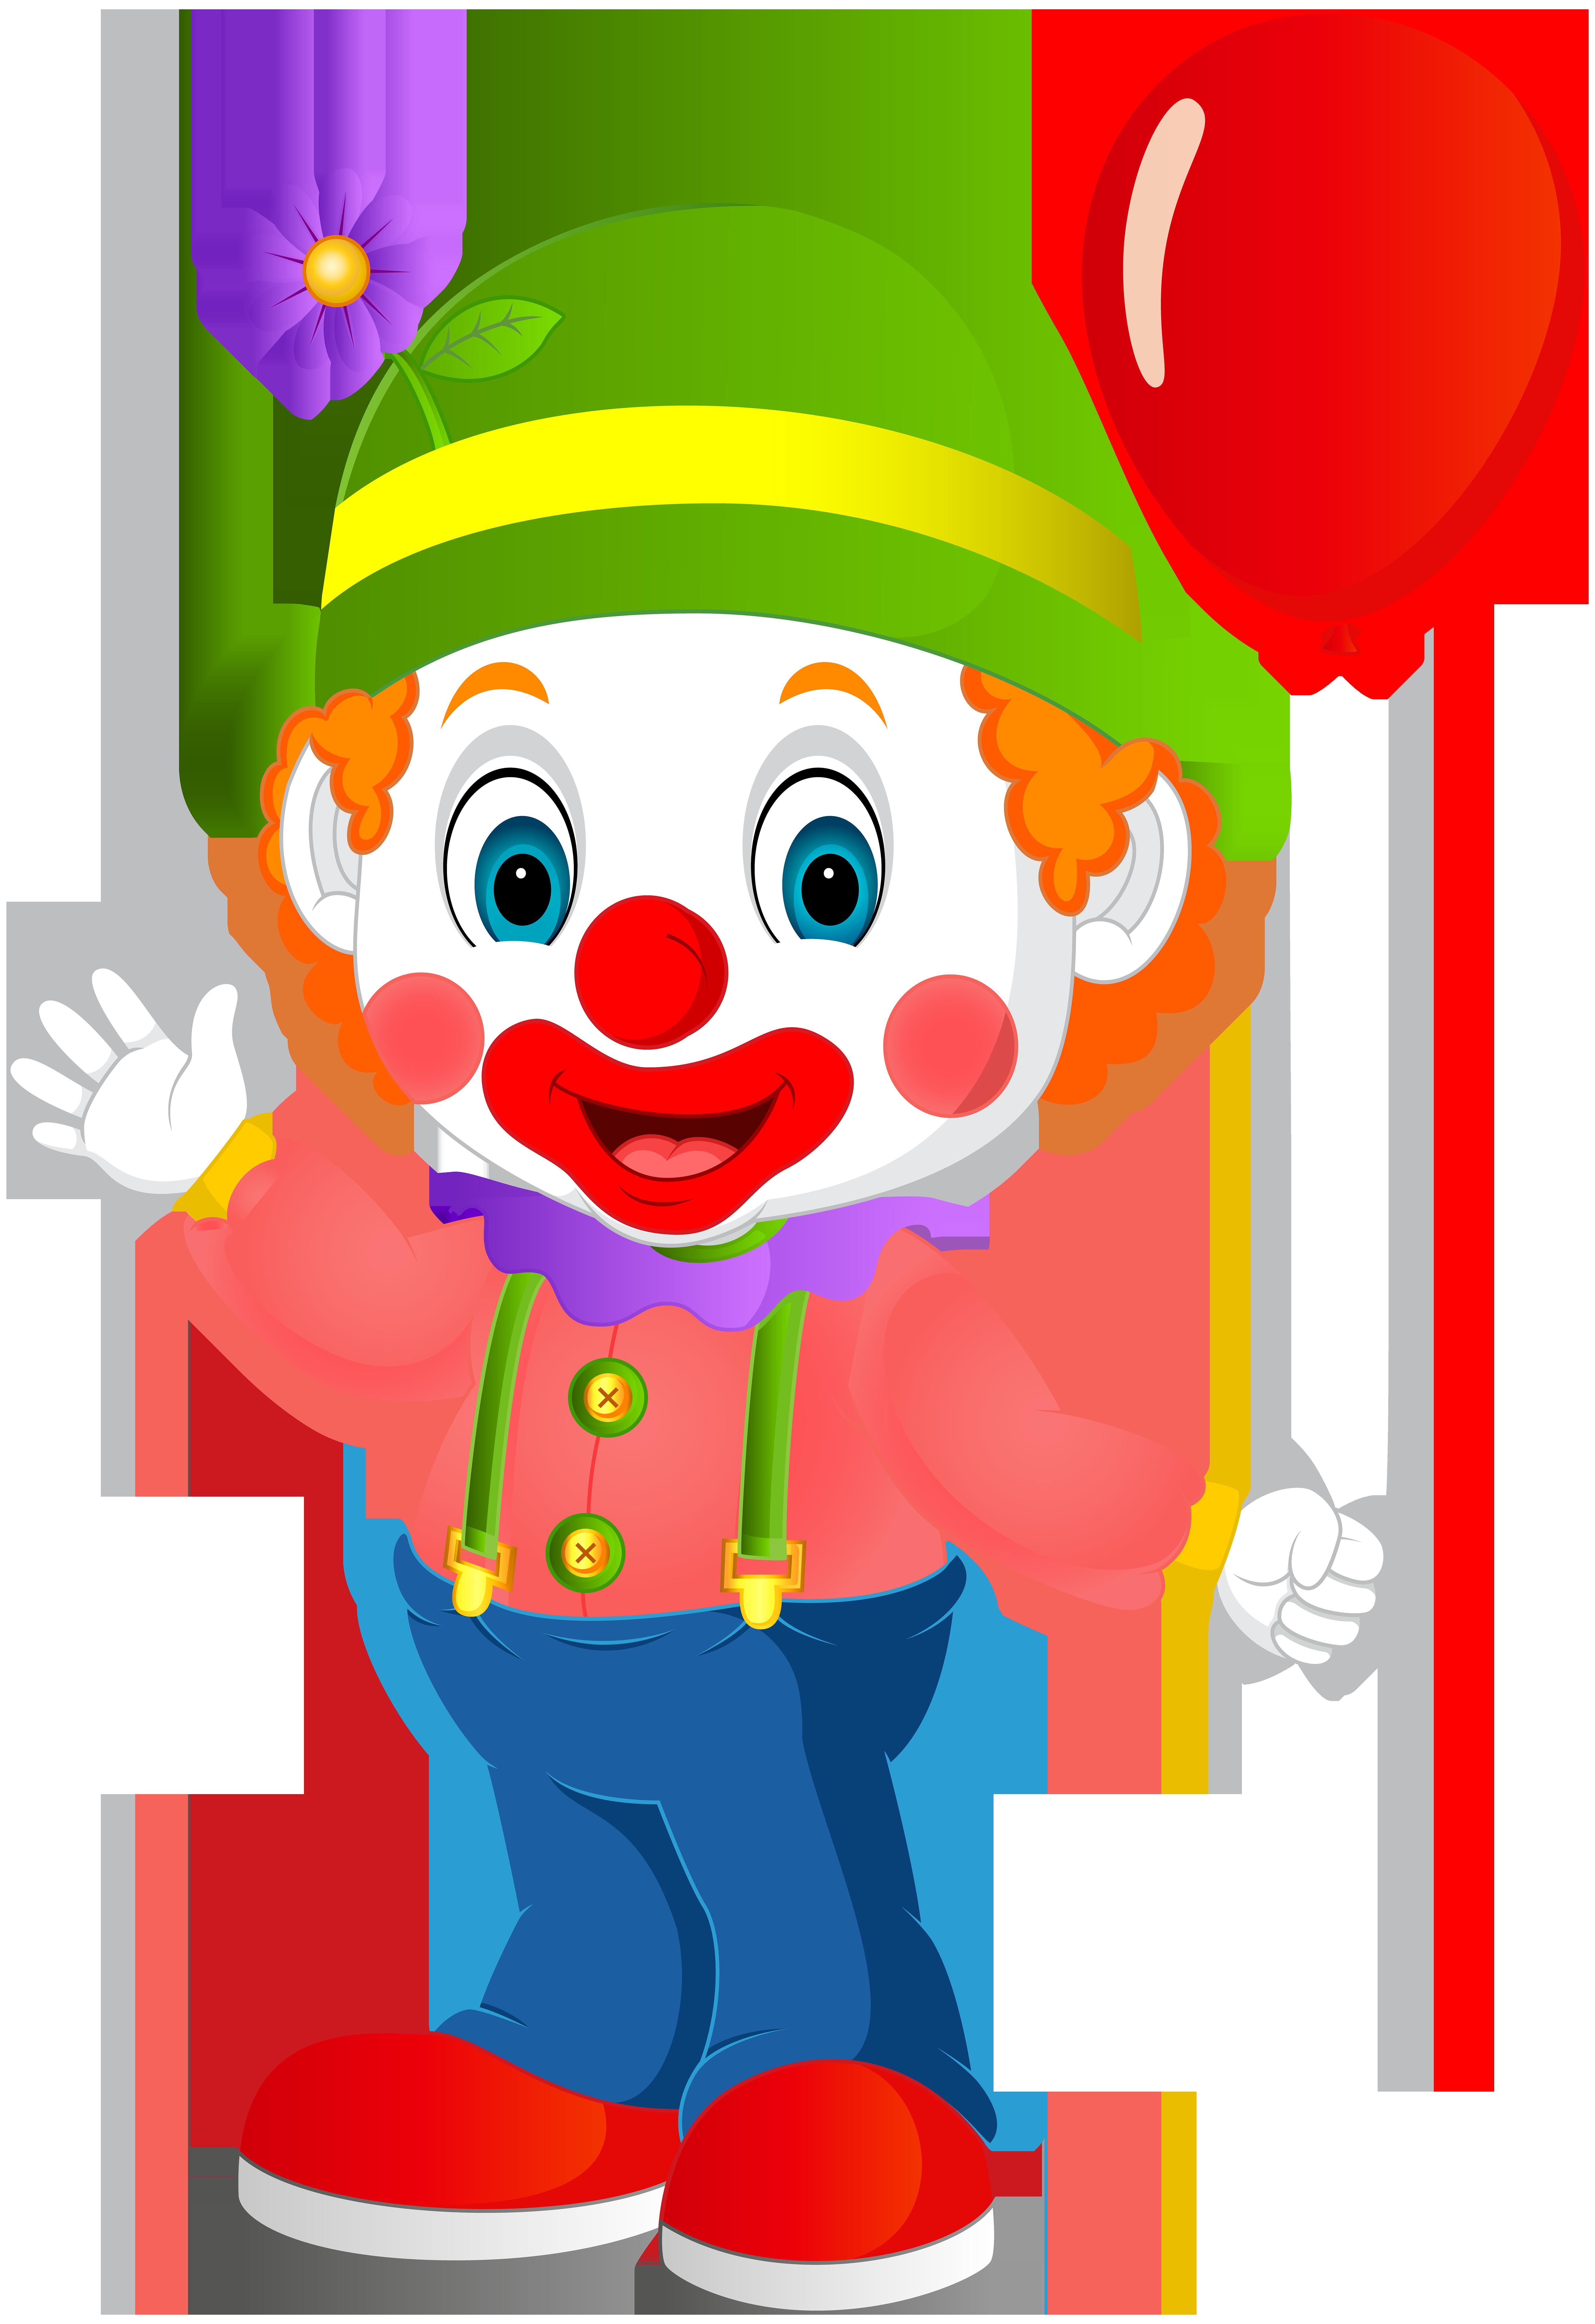 Clipart clown clip transparent download Cute Clown Transparent PNG Clip Art Image | Gallery Yopriceville ... clip transparent download